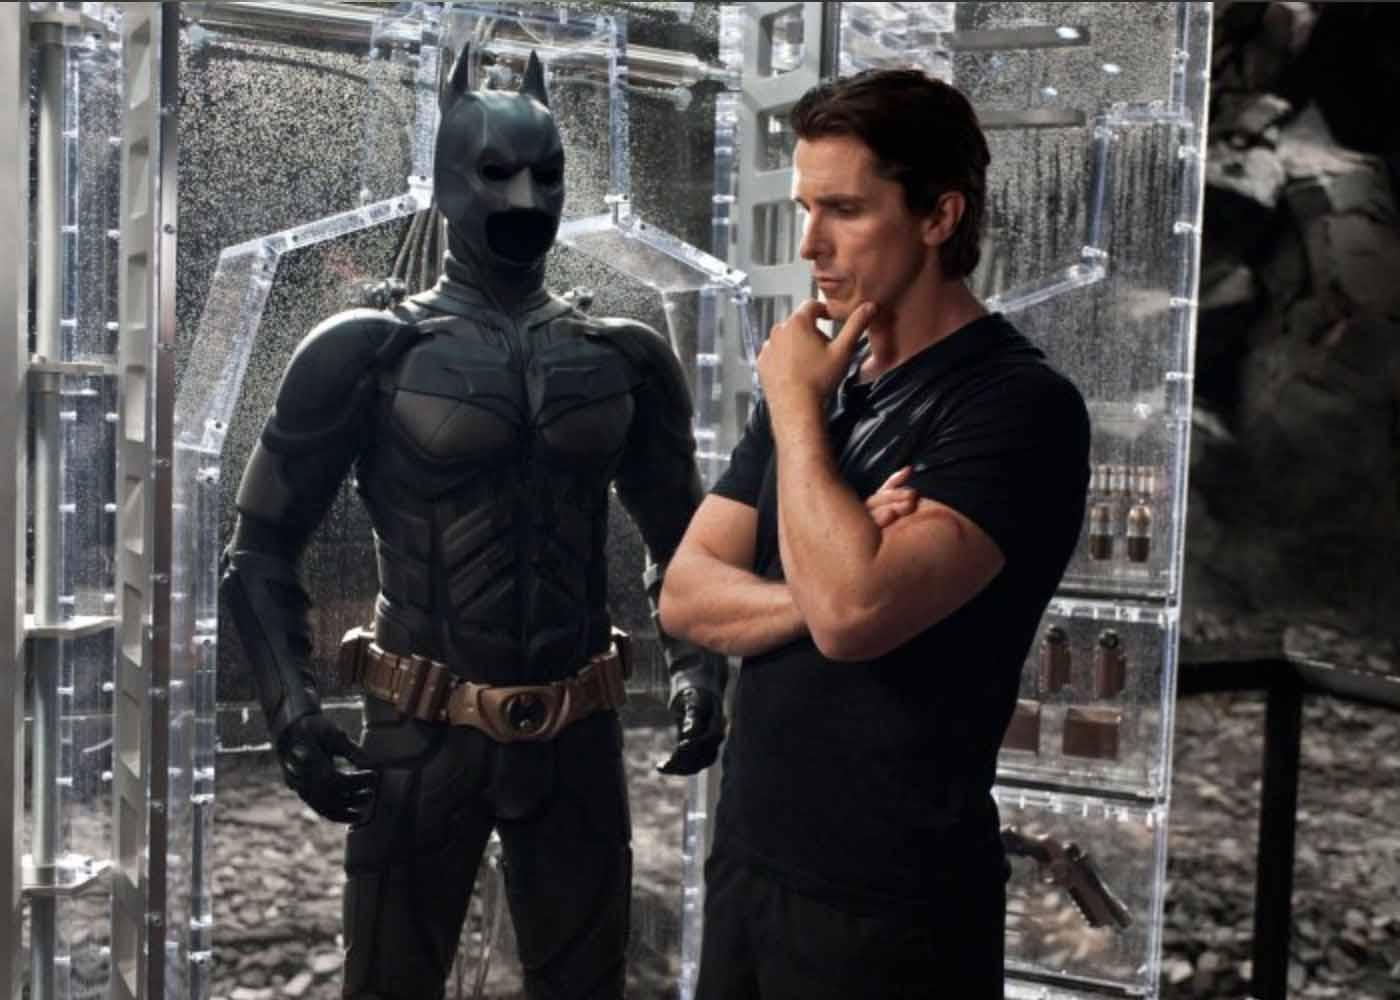 Christian Bale Not Interested in Returning to Superhero Films